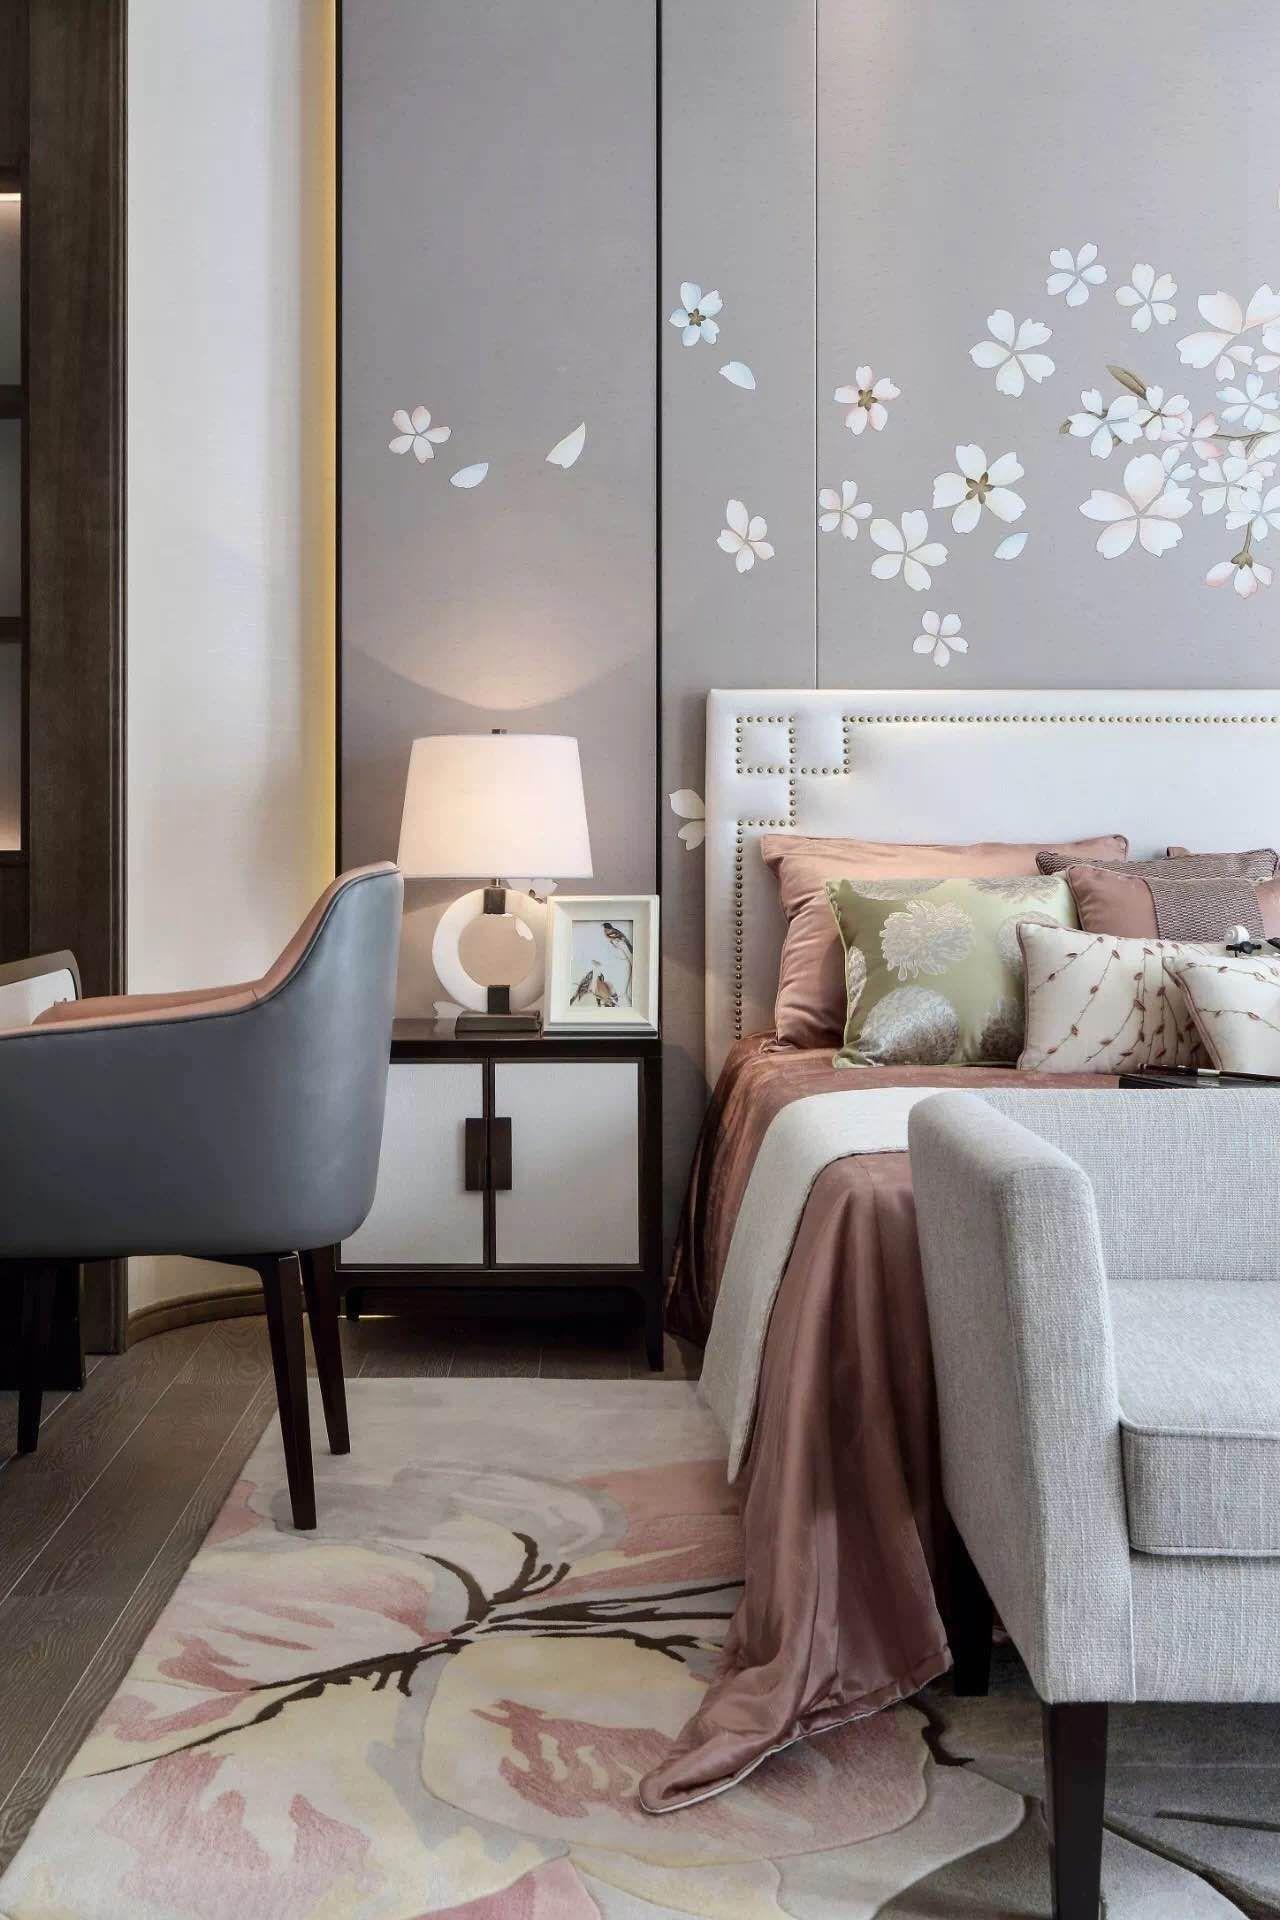 Pin de gonzalo de la lastra leyva en dormitorio for Decoracion habitacion matrimonio moderna